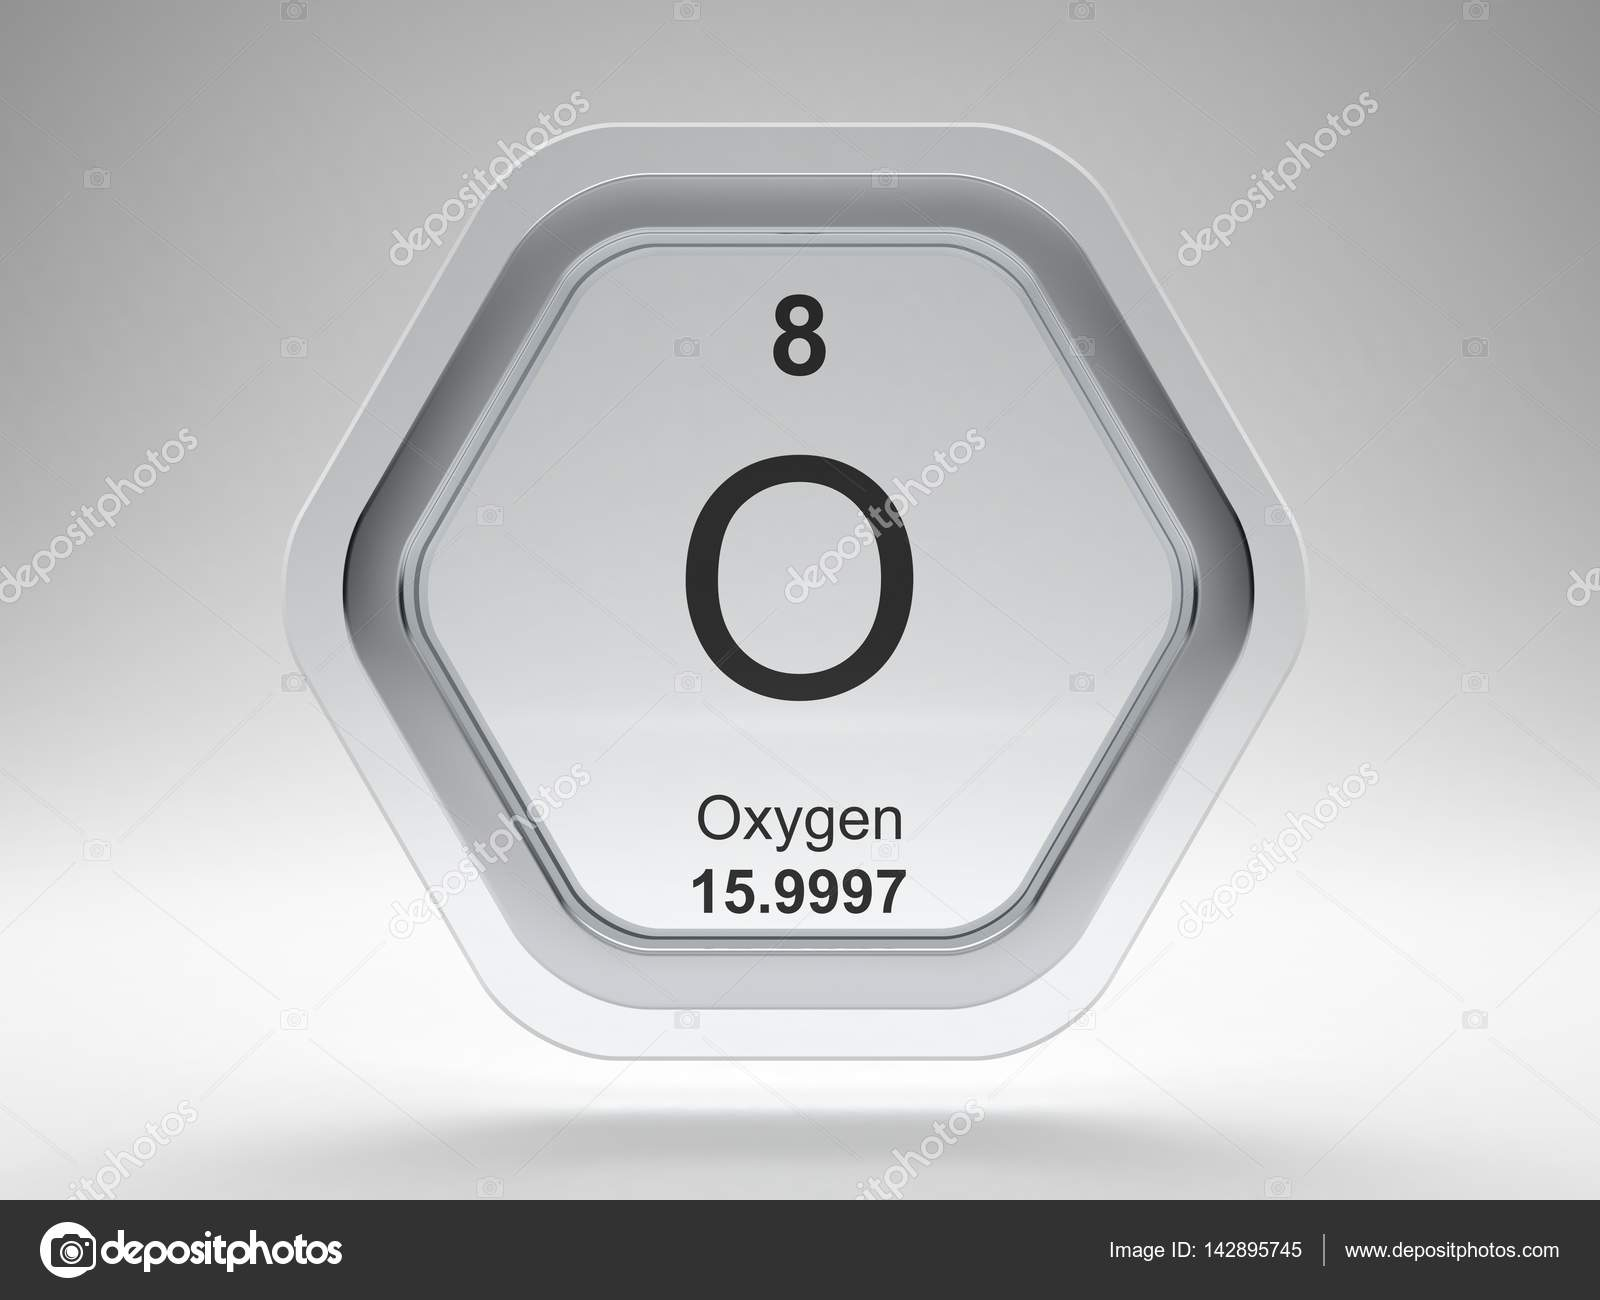 Oxygen element symbol stock photo conceptw 142895745 oxygen element symbol stock photo buycottarizona Choice Image